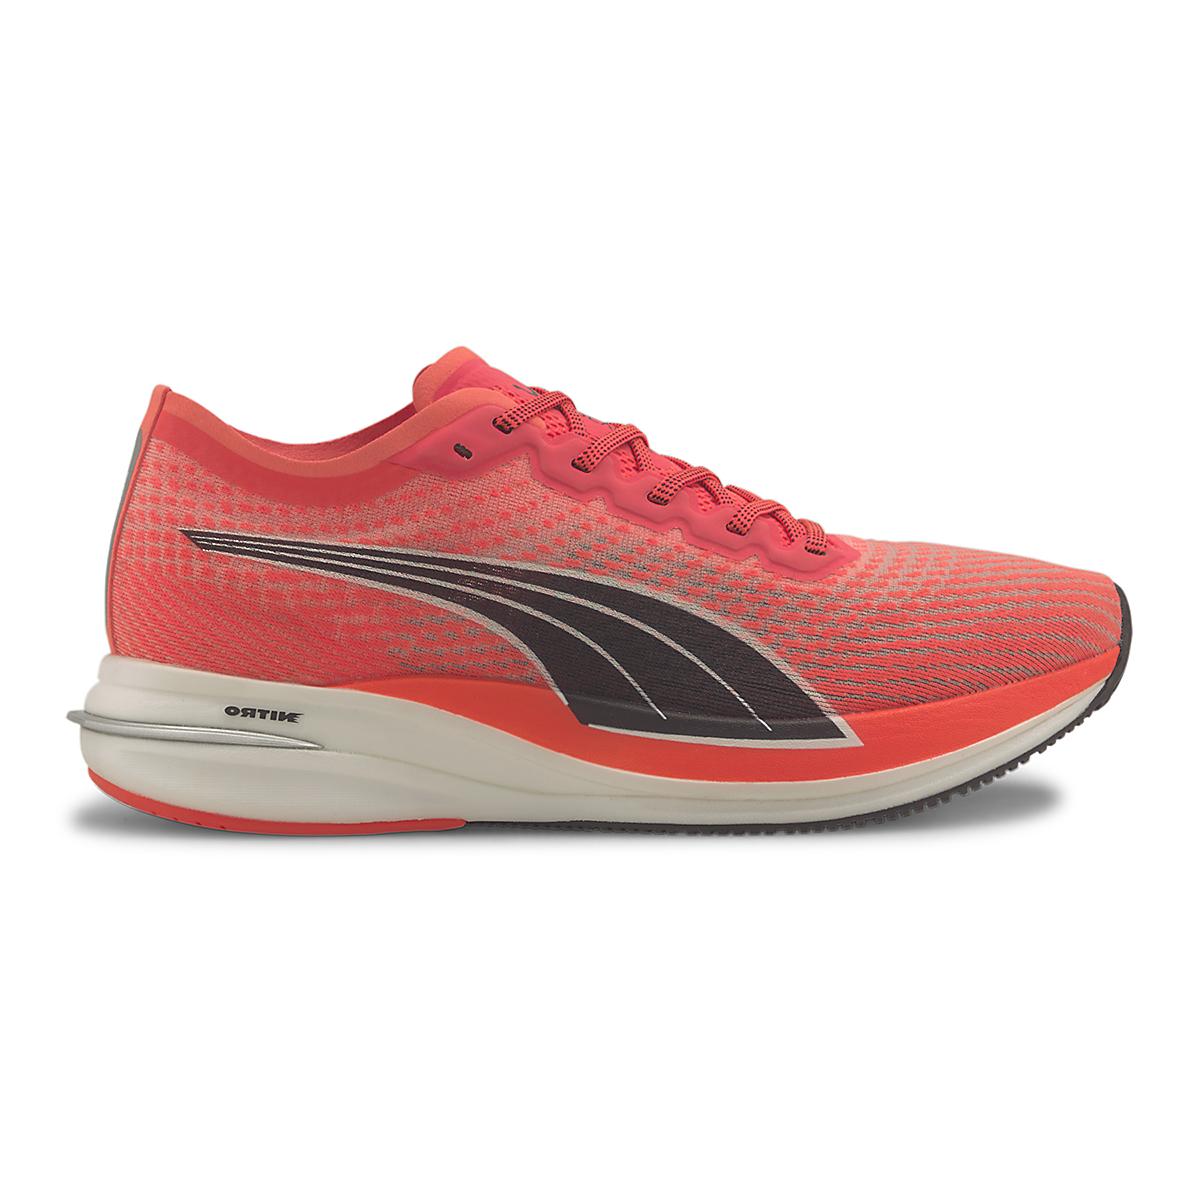 Men's Puma Deviate Nitro Running Shoe - Color: Lava Blast-Puma Black - Size: 7 - Width: Regular, Lava Blast-Puma Black, large, image 1